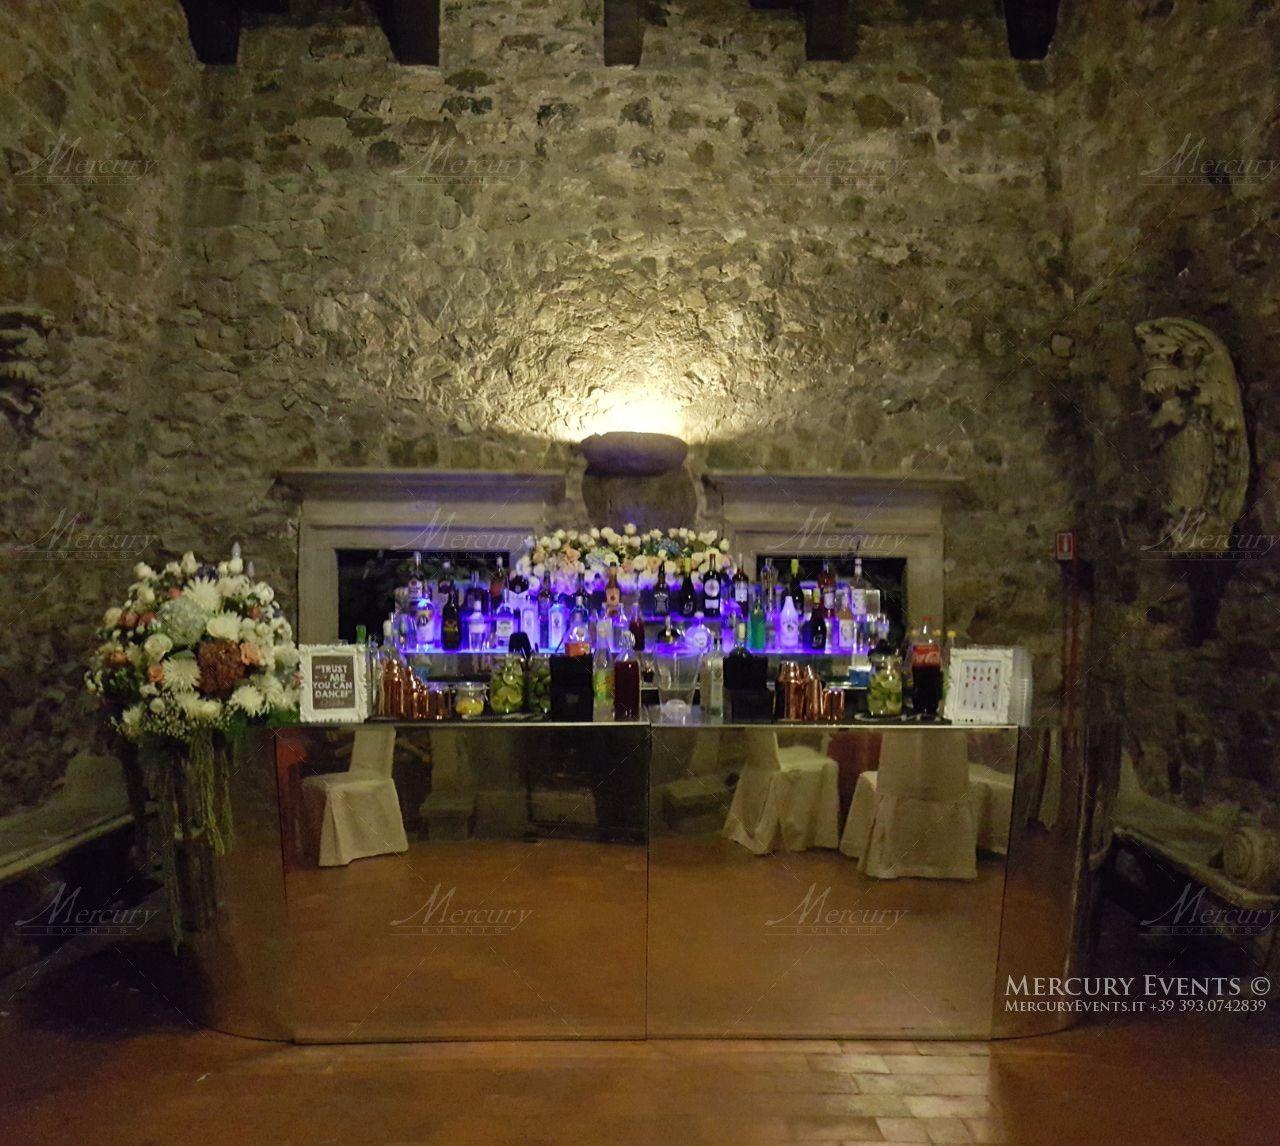 Indian Wedding Party - Castello di Castellammare